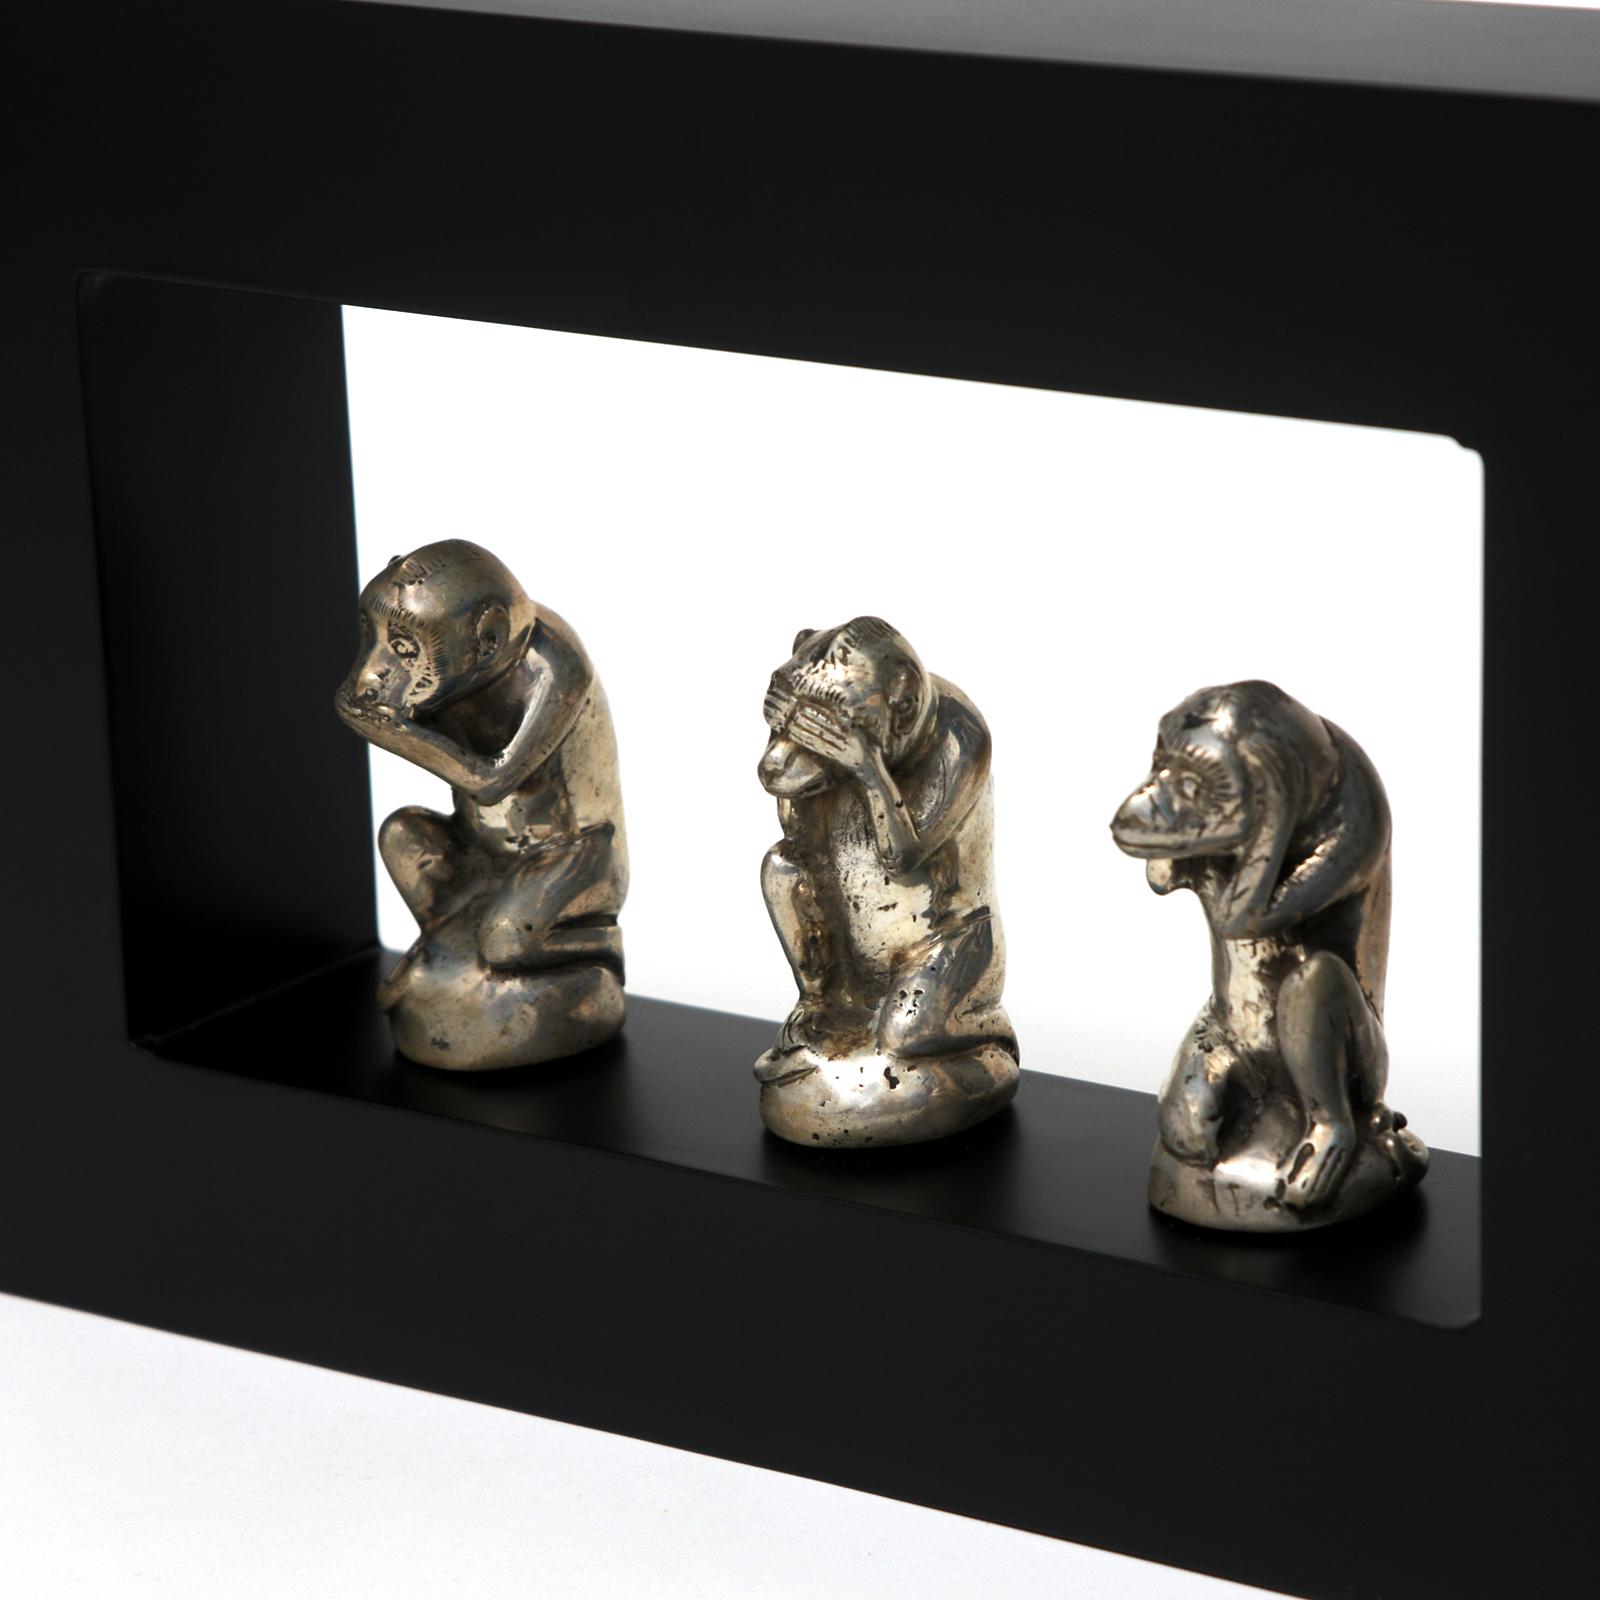 3 affen statue holz metall silber nichts sagen sehen h ren. Black Bedroom Furniture Sets. Home Design Ideas